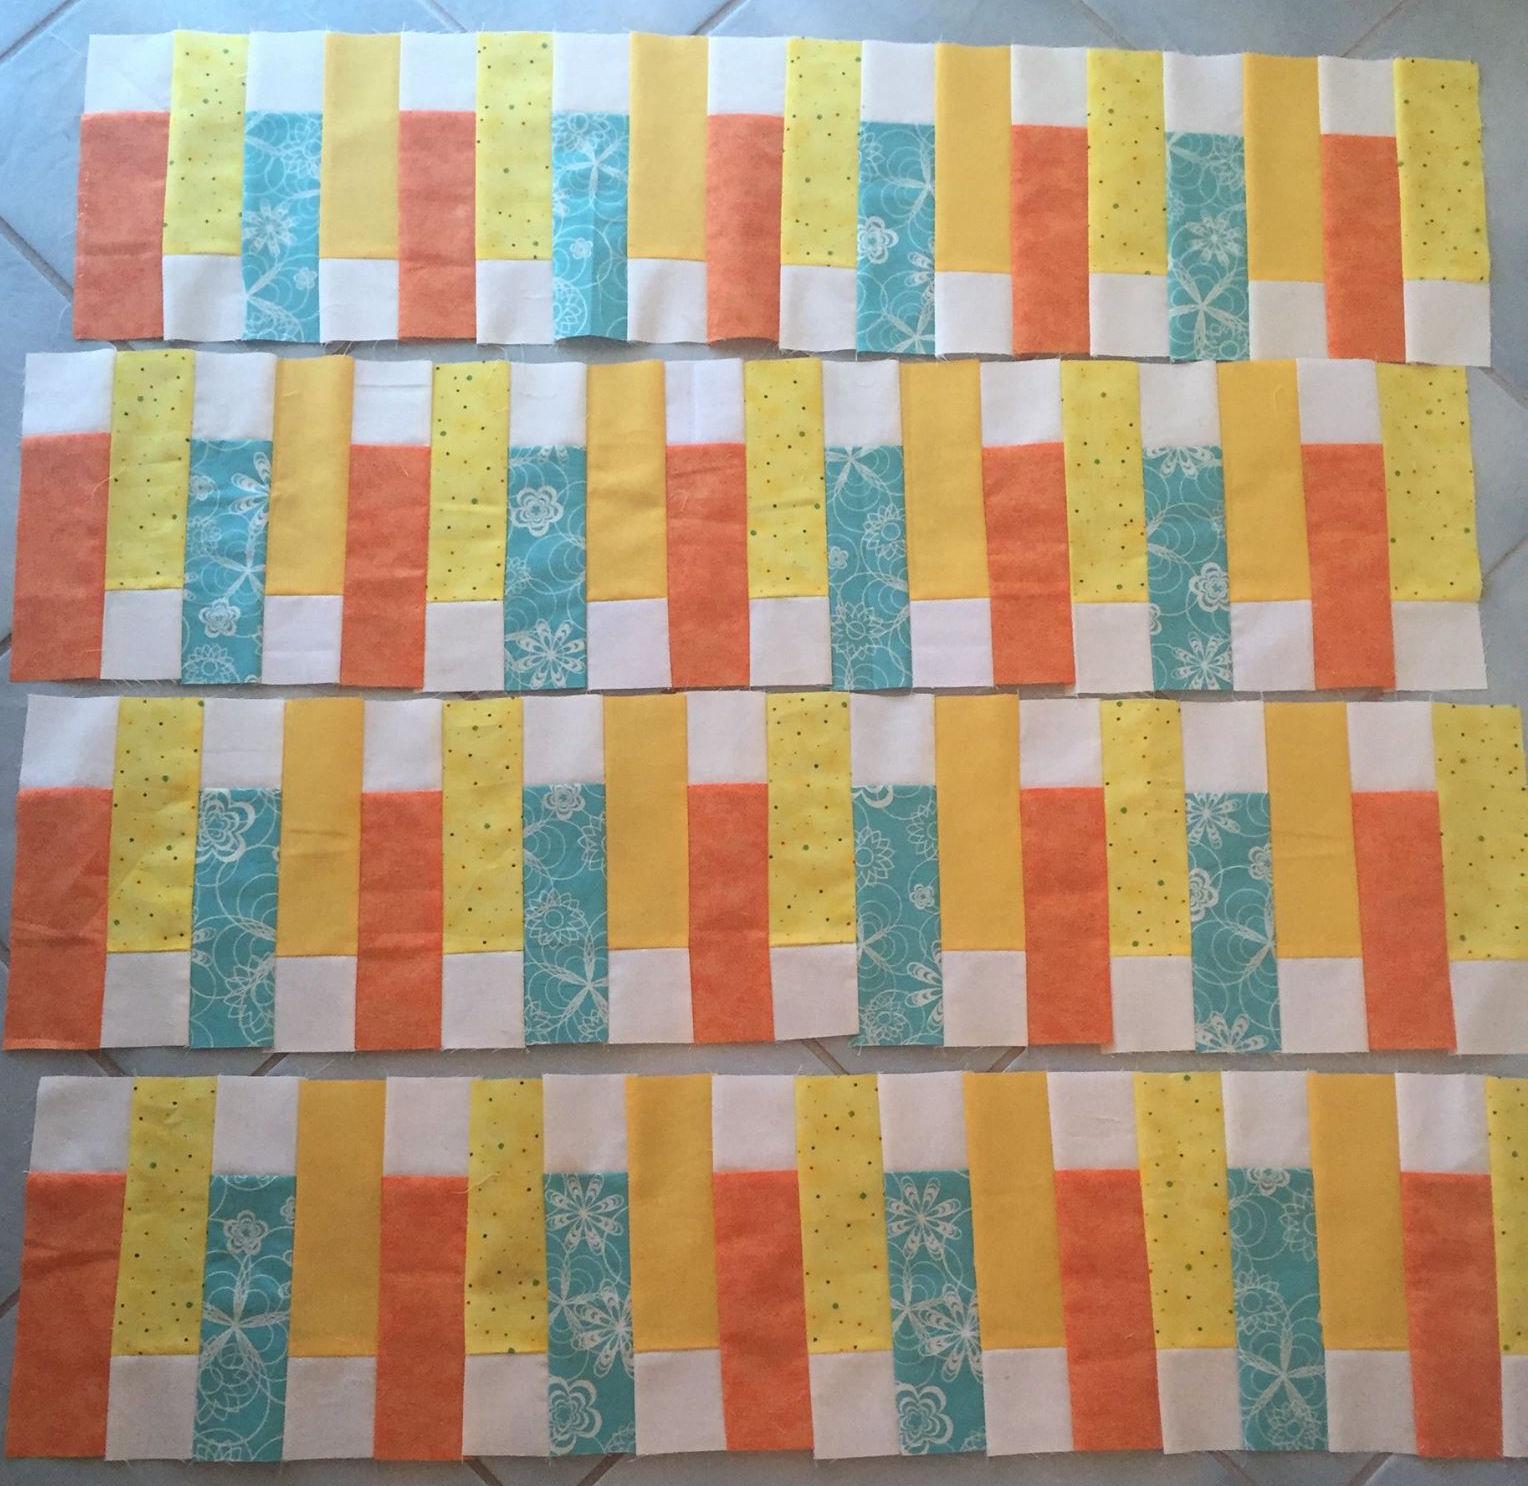 Sunset Ridge blocks made by Susan Capone